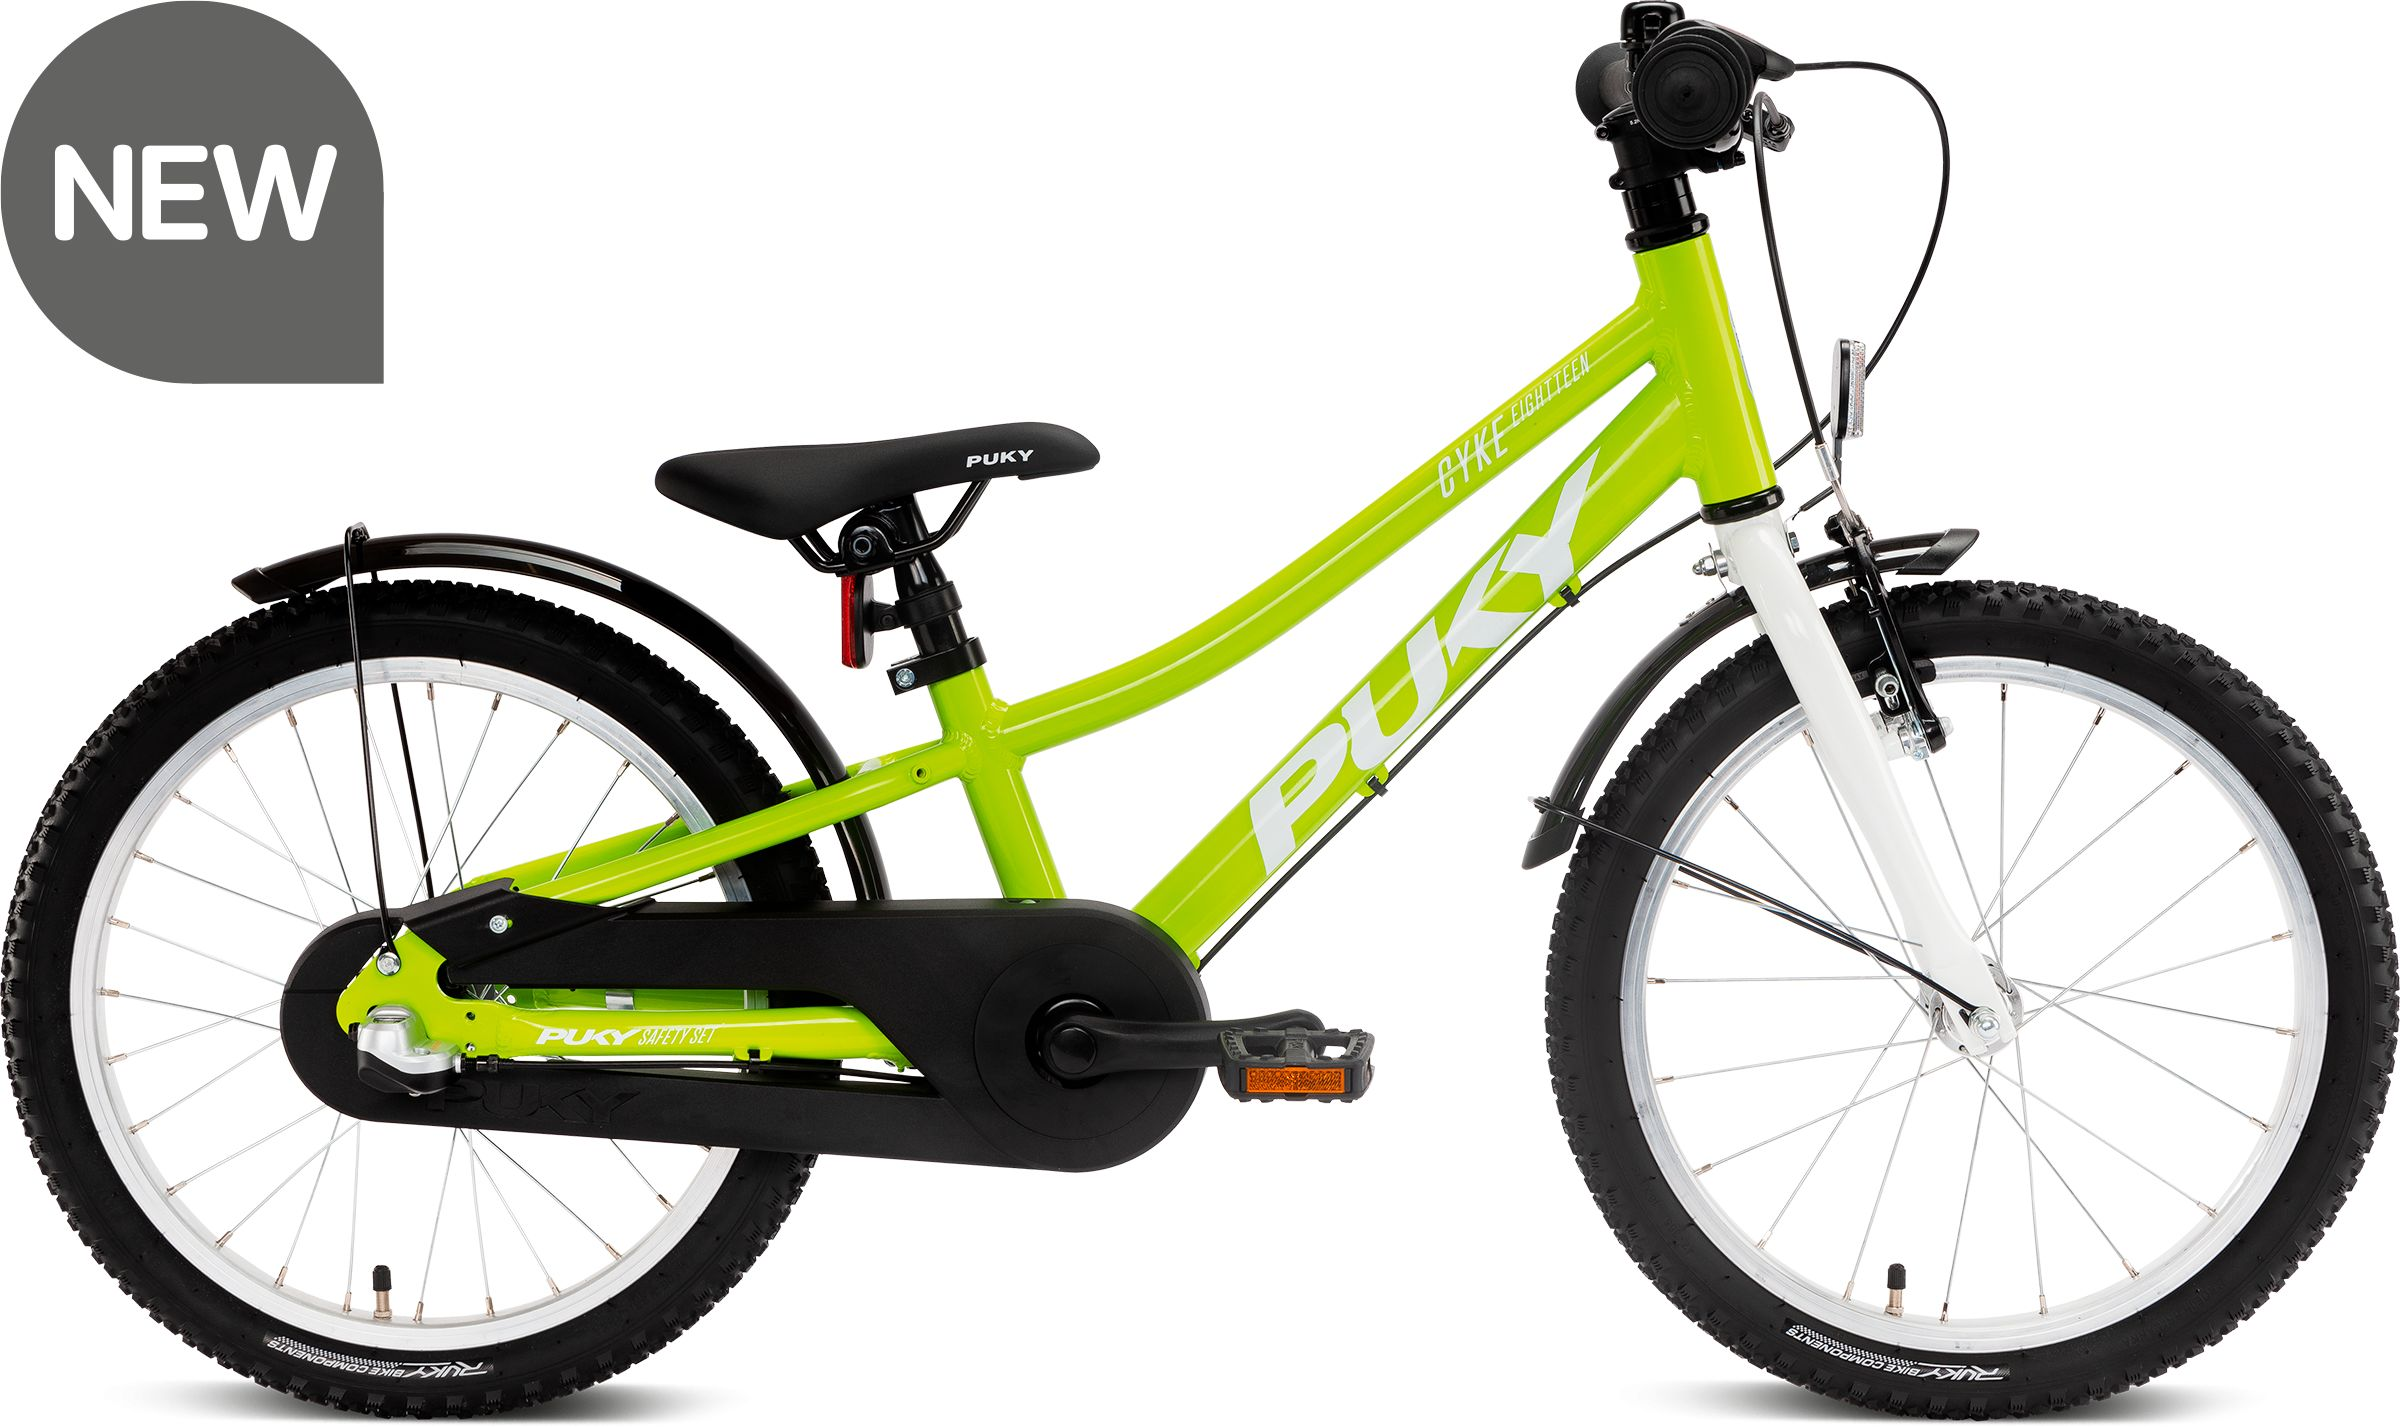 Rower Puky Cyke 18-3 Fresh green 4406